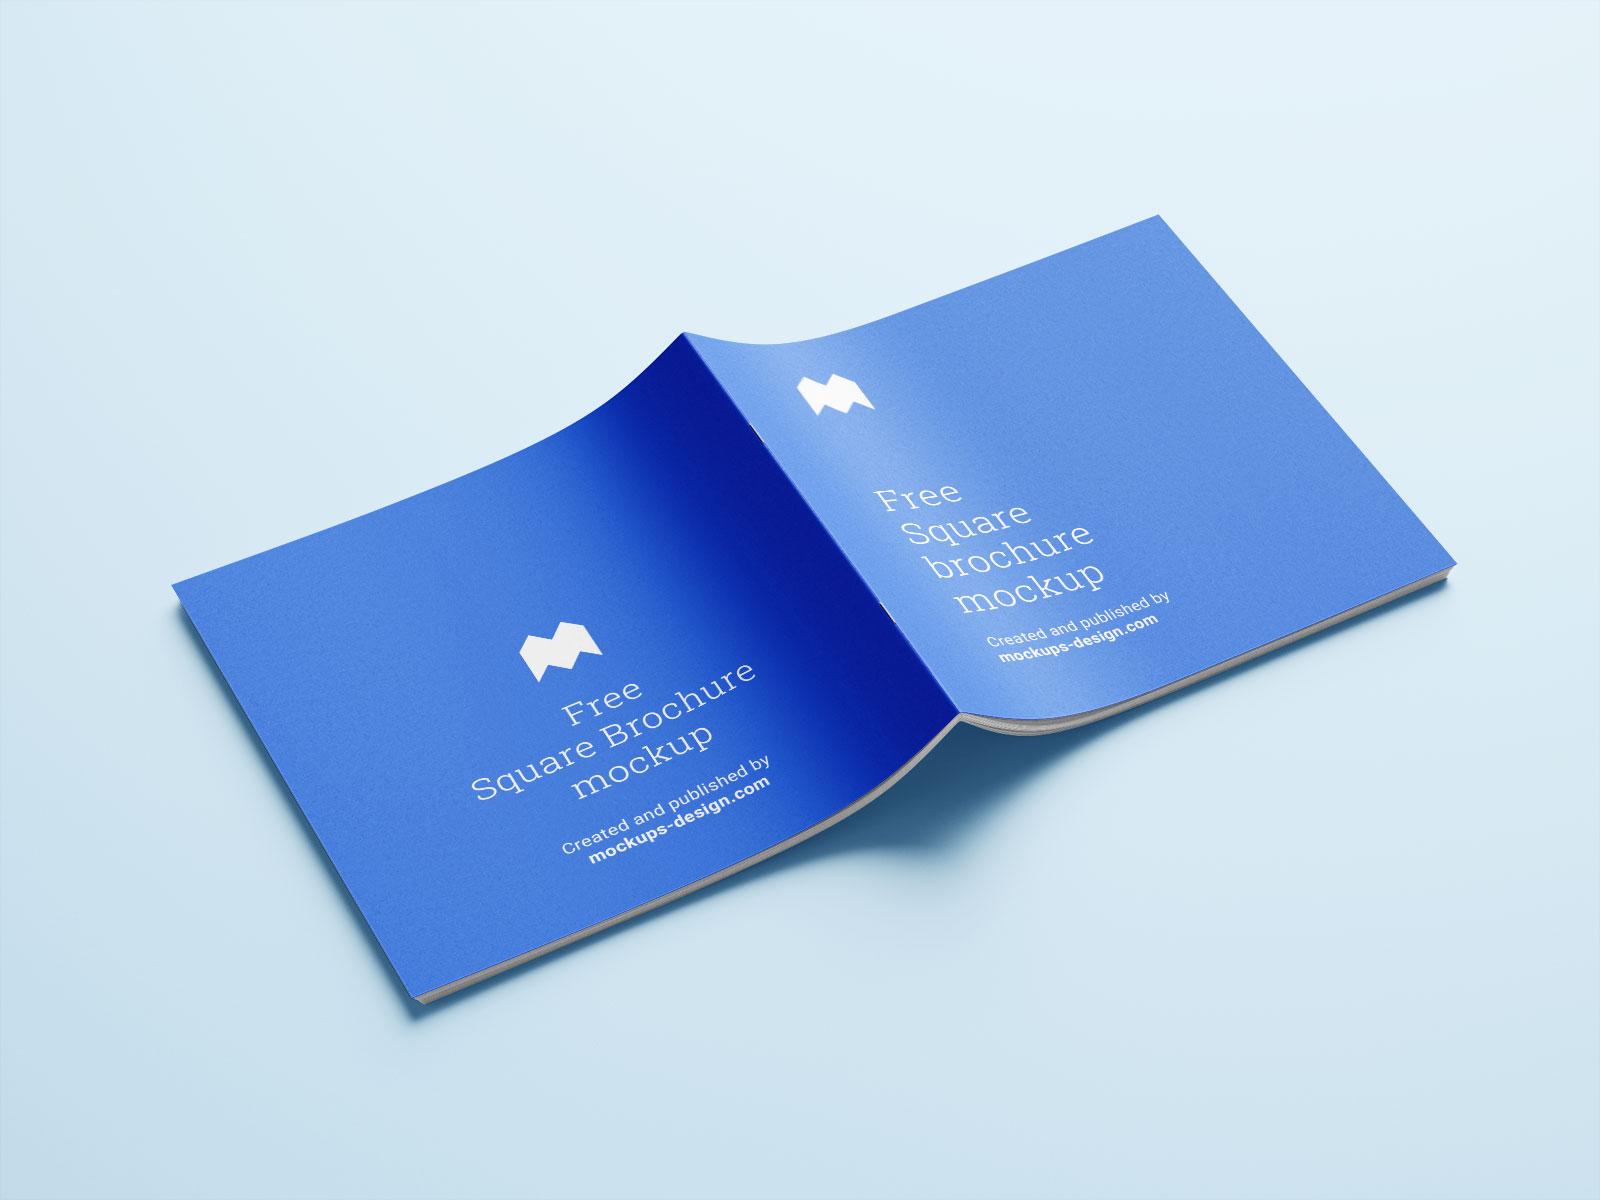 Free_Square_Brochure_Magazine_Mockup_PSD-Set (7)